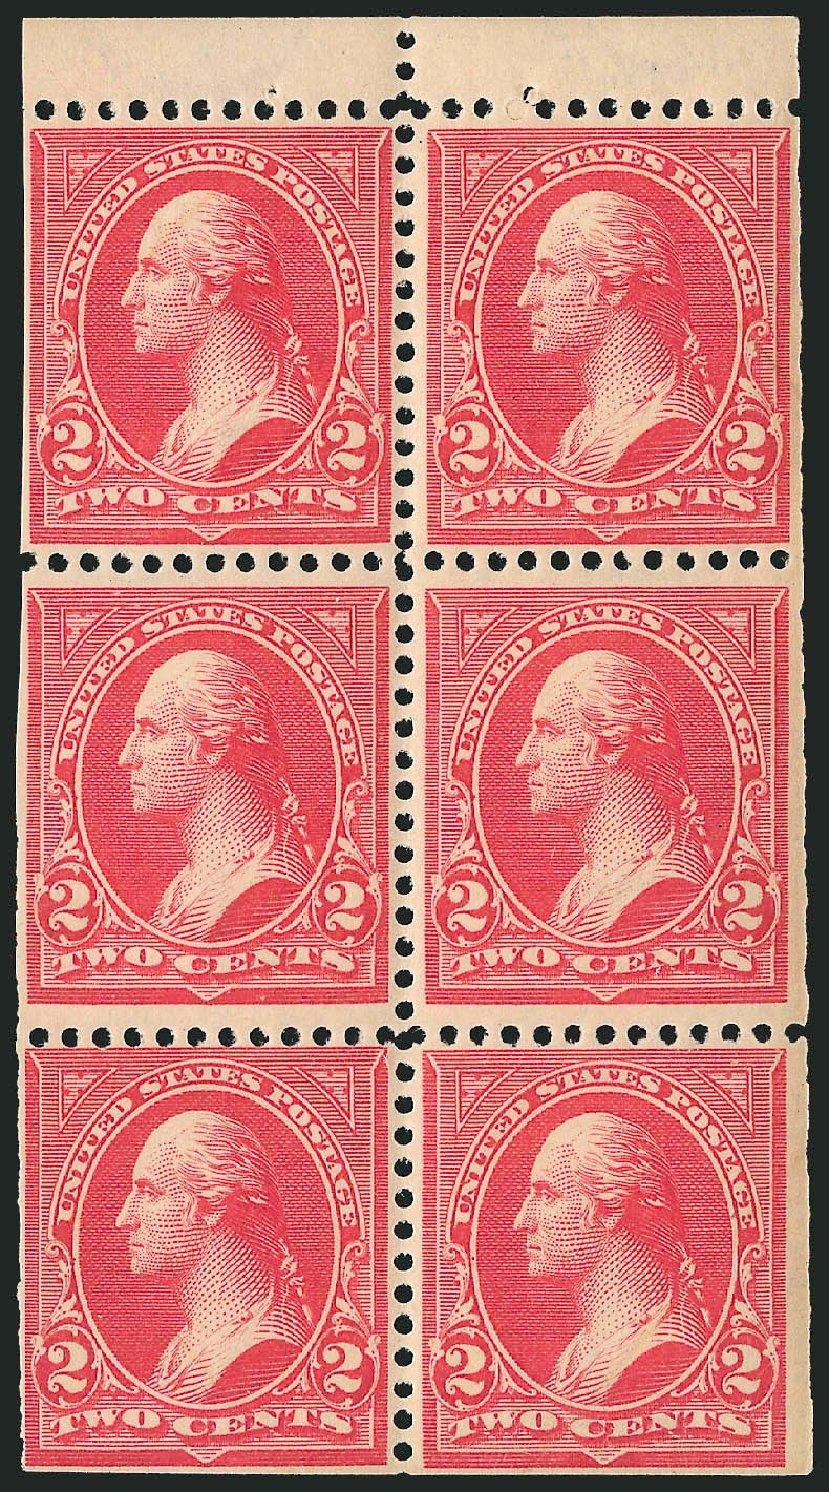 US Stamps Prices Scott Catalogue #279B: 1897 2c Washington. Robert Siegel Auction Galleries, Mar 2014, Sale 1067, Lot 1294